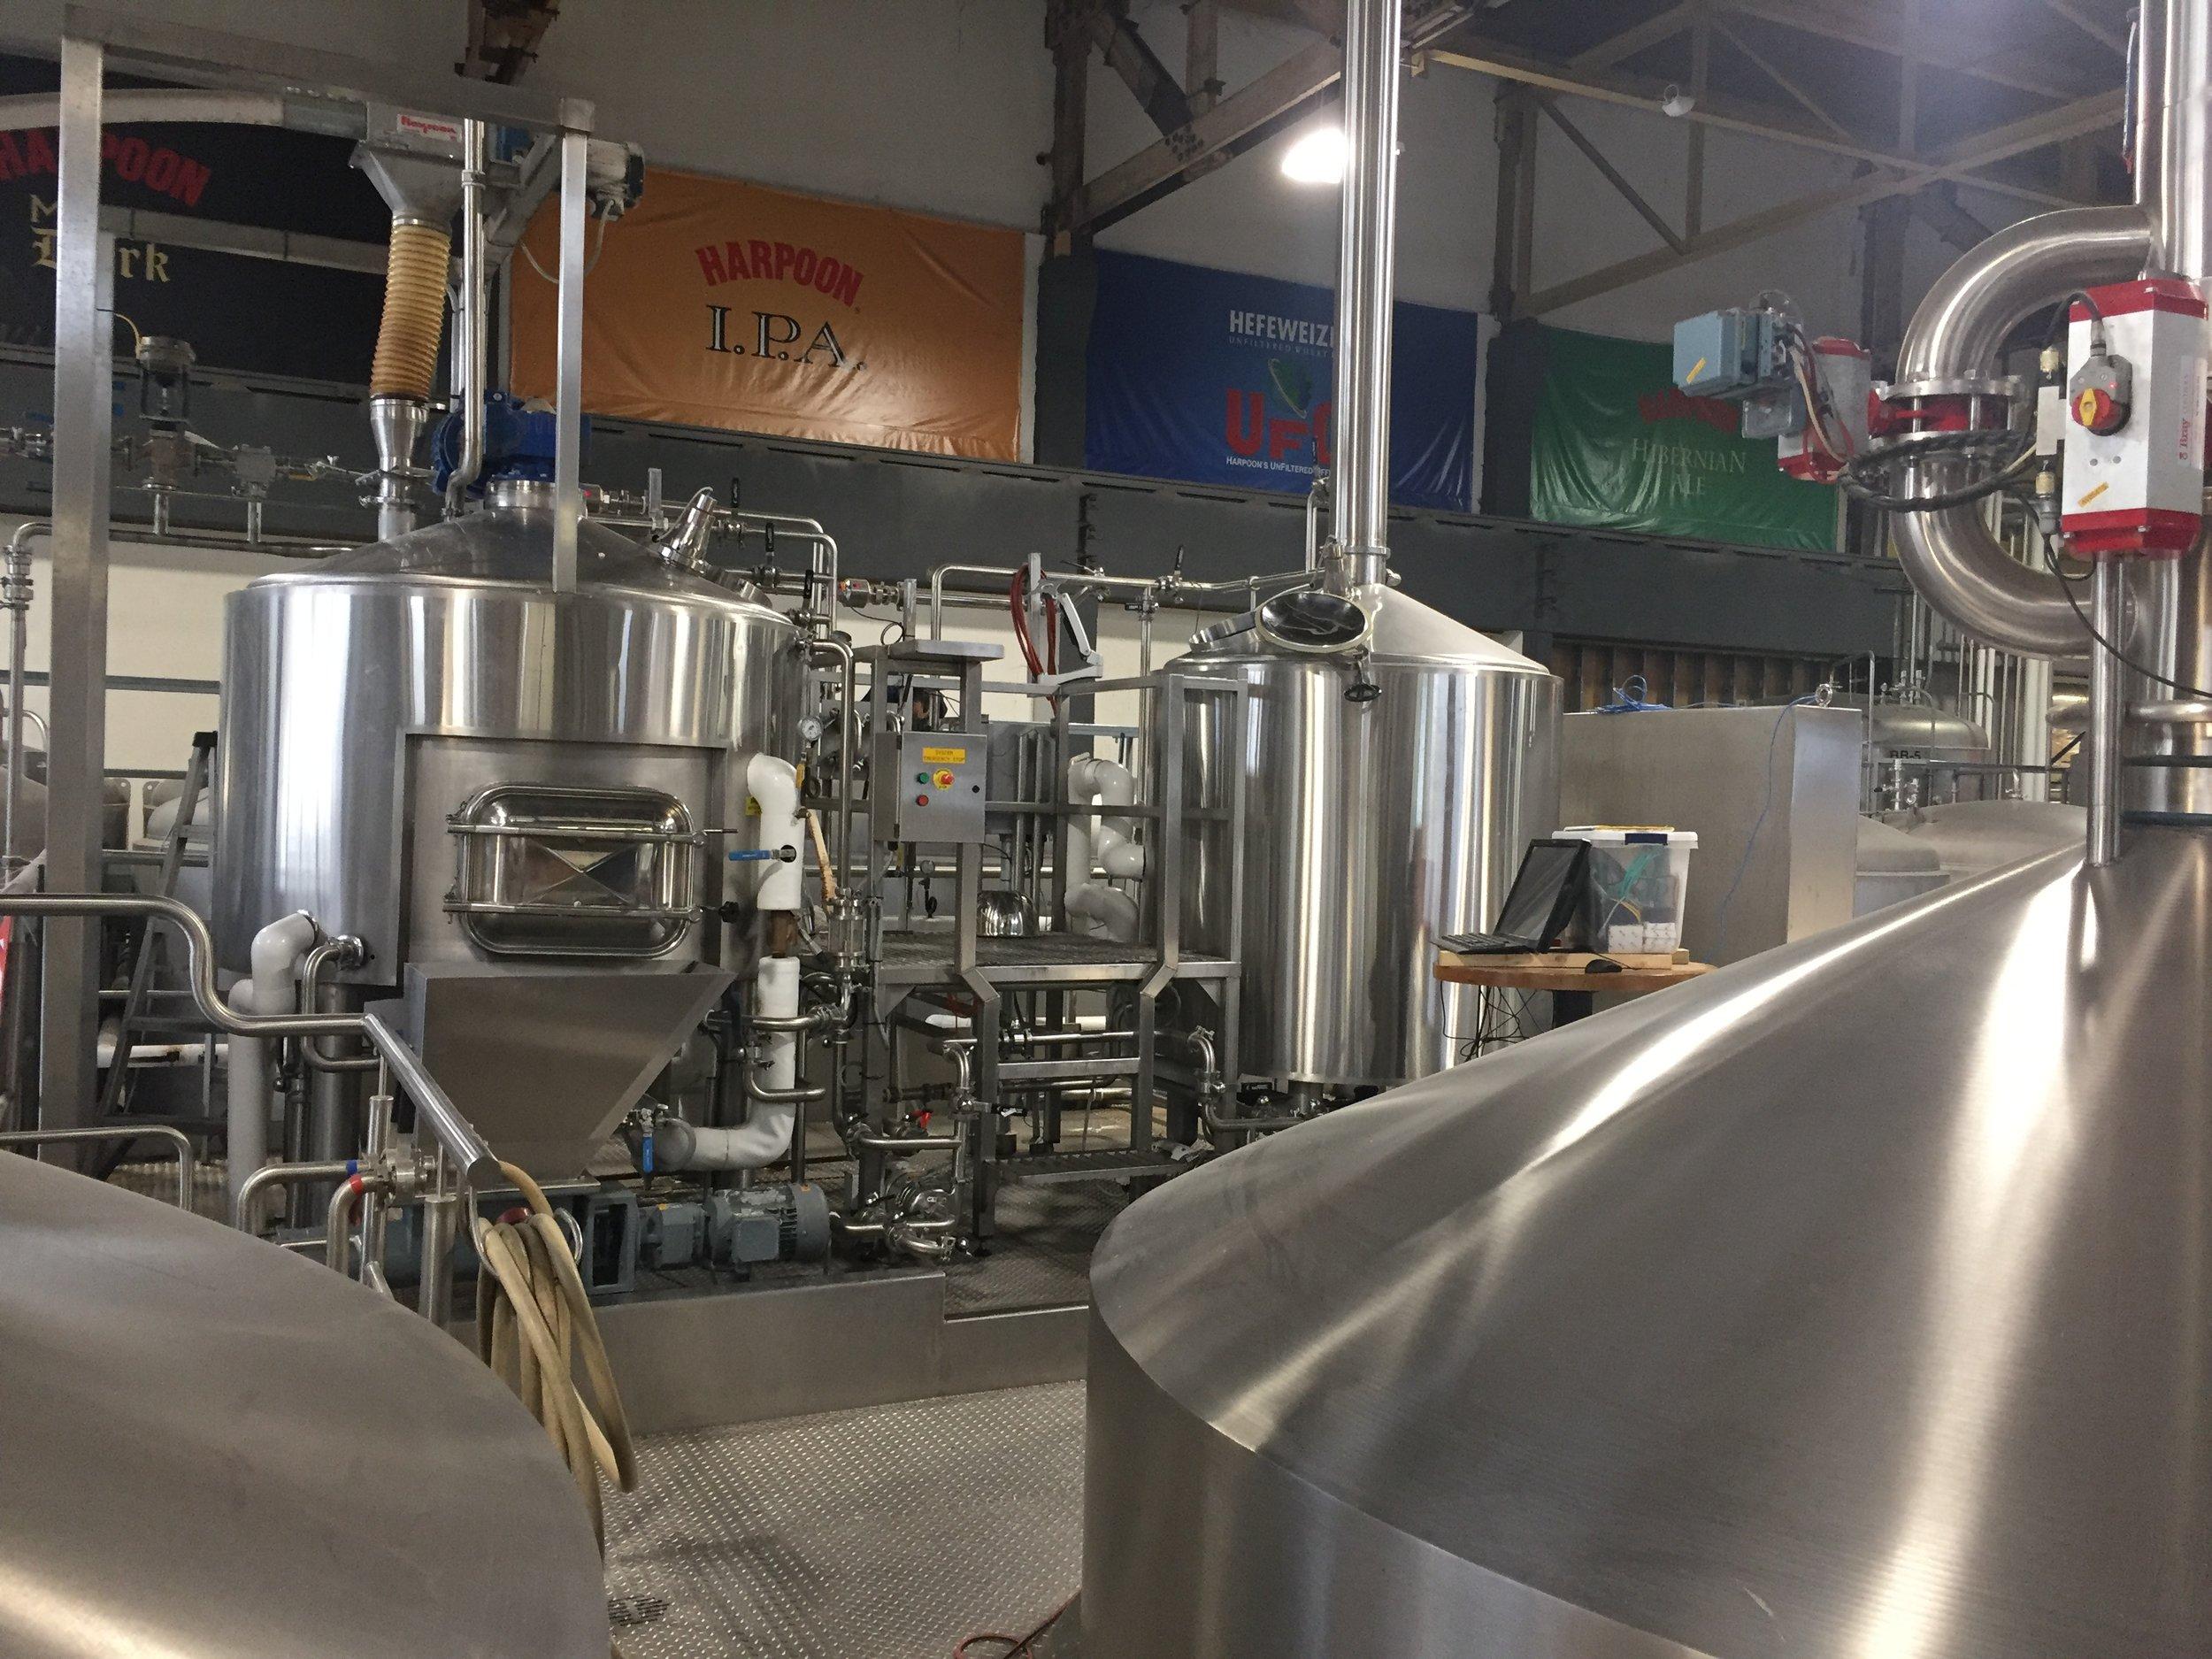 10-barrel brewery